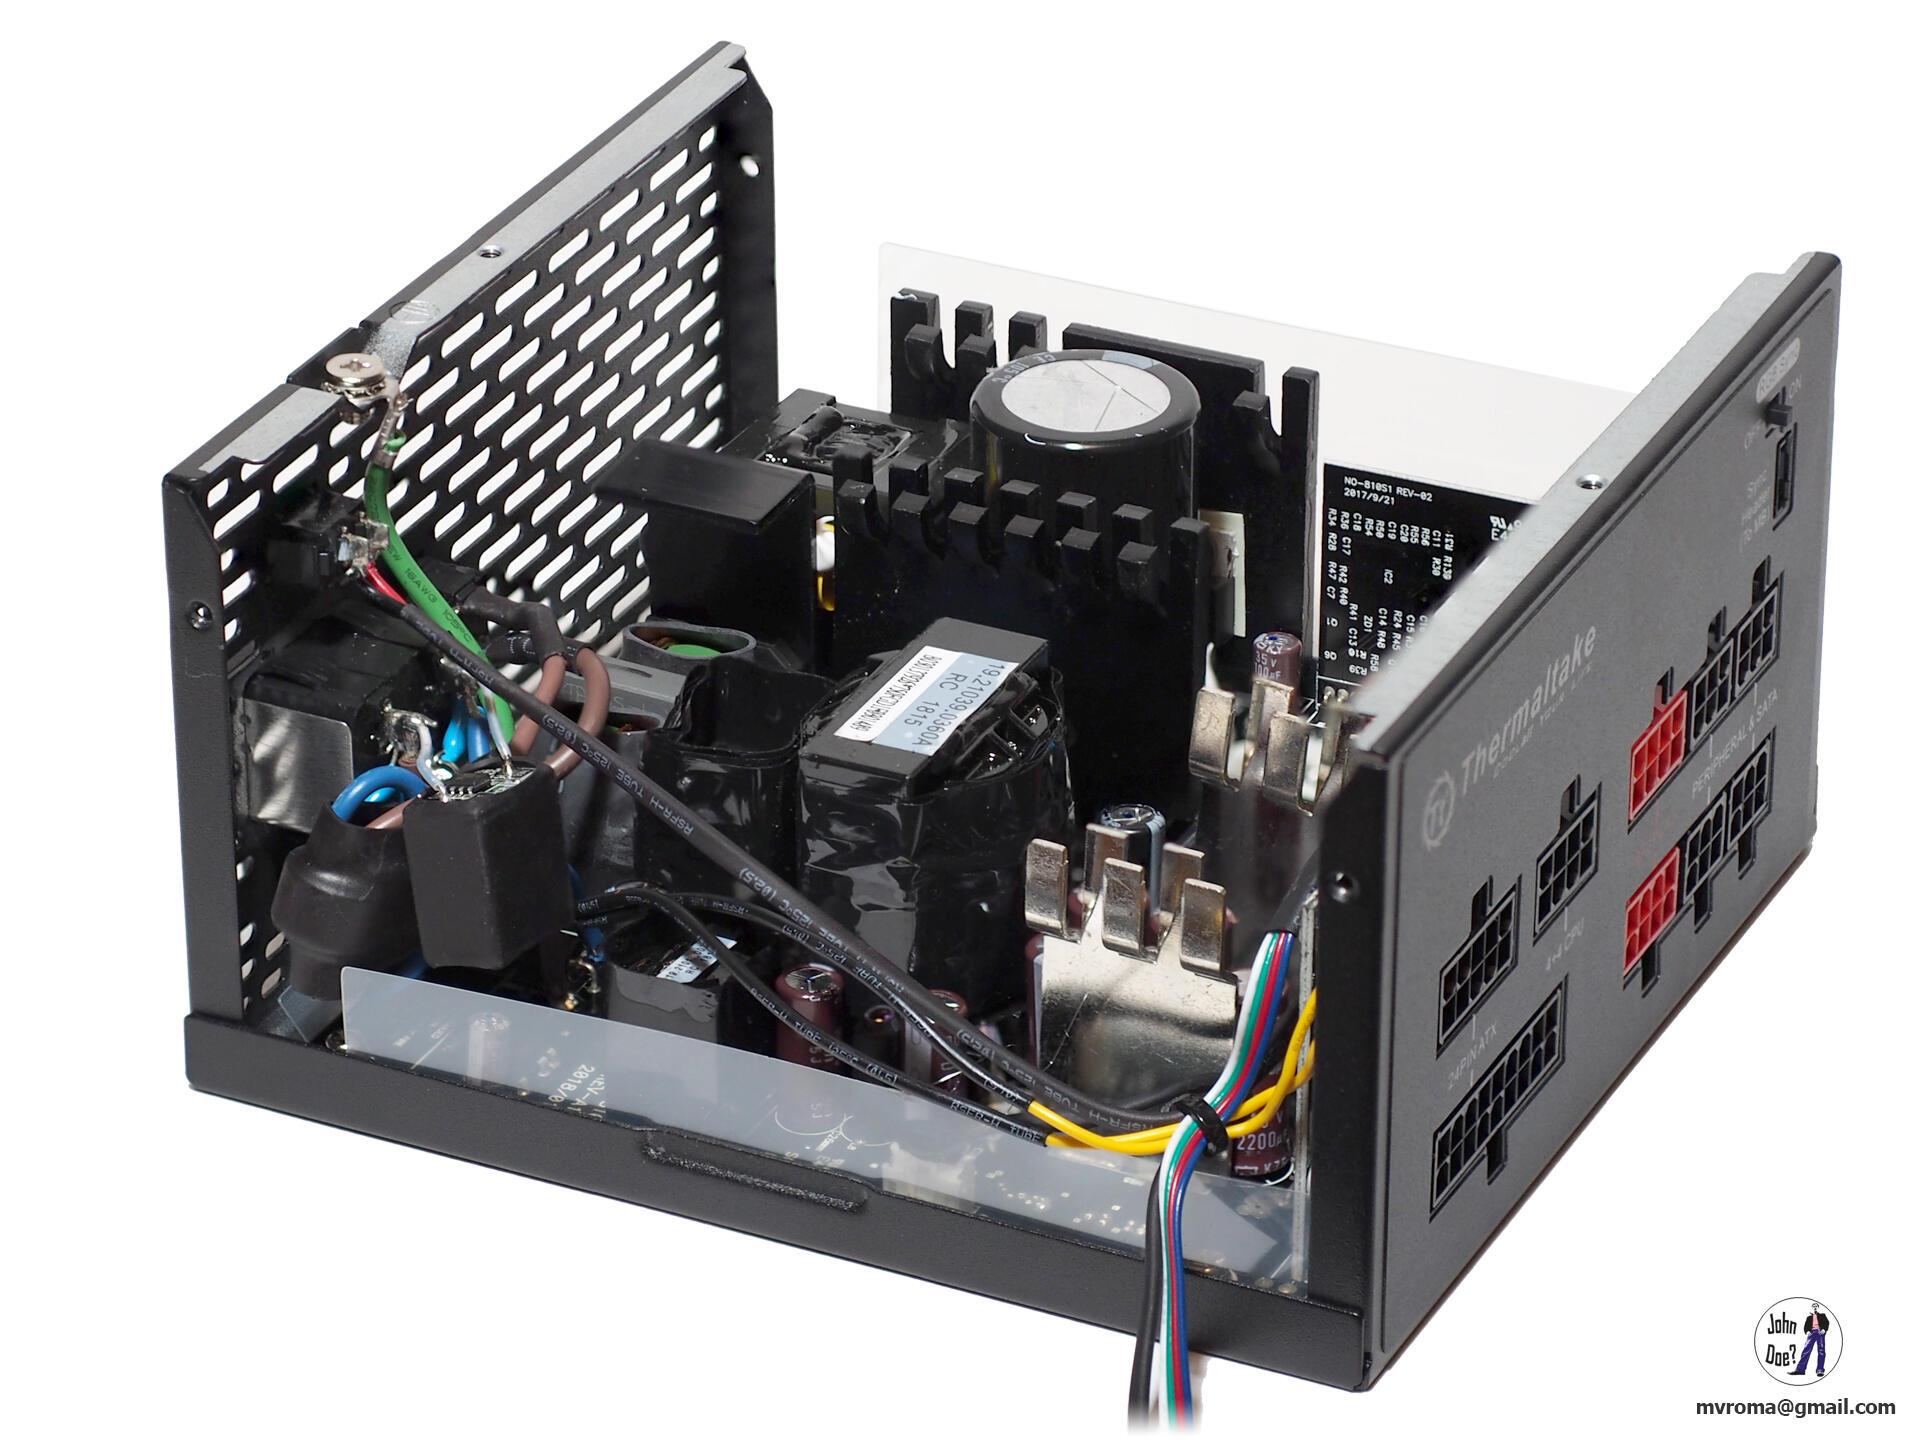 Kompyutery i komplektuyushcie - Obzor bloka pitaniya Thermaltake Toughpower Grand RGB 750W Sync Edition (PS-TPG-0750FPCGEU-S)